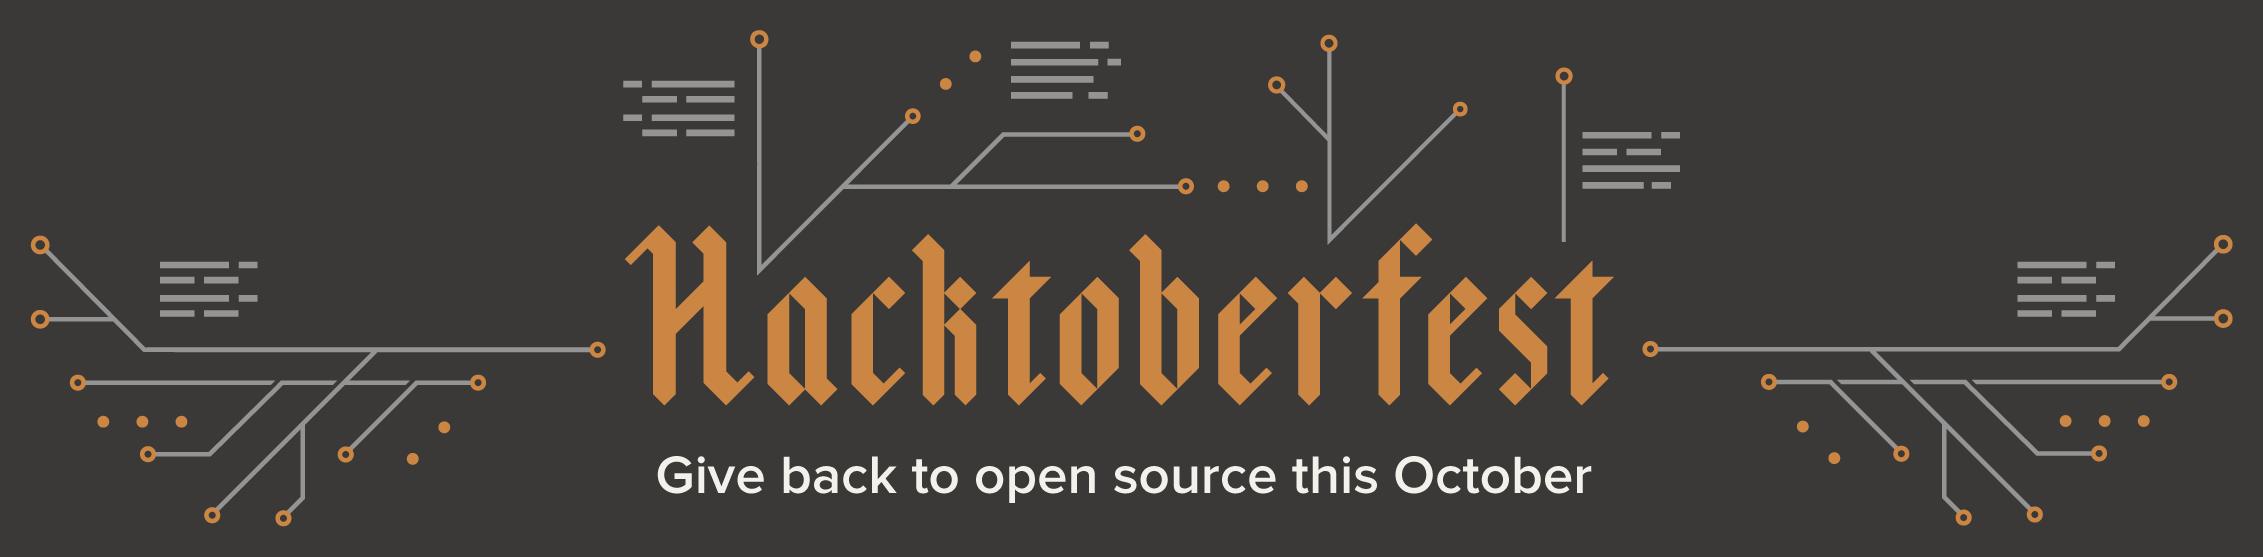 Hacktoberfest